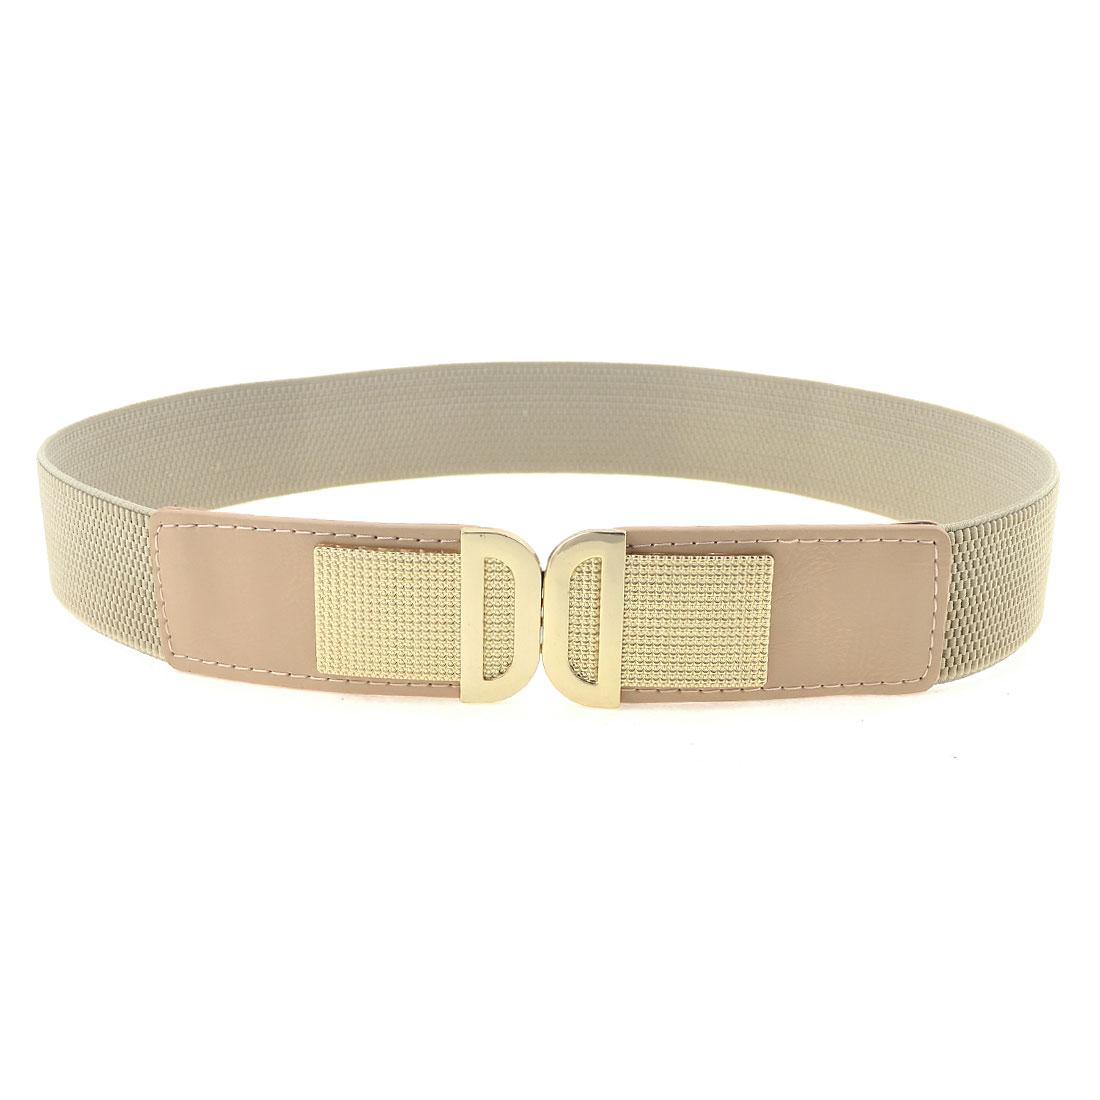 Lady Light Gray Litchi Print Gold Tone Interlocking Buckle Stretchy Cinch Belt